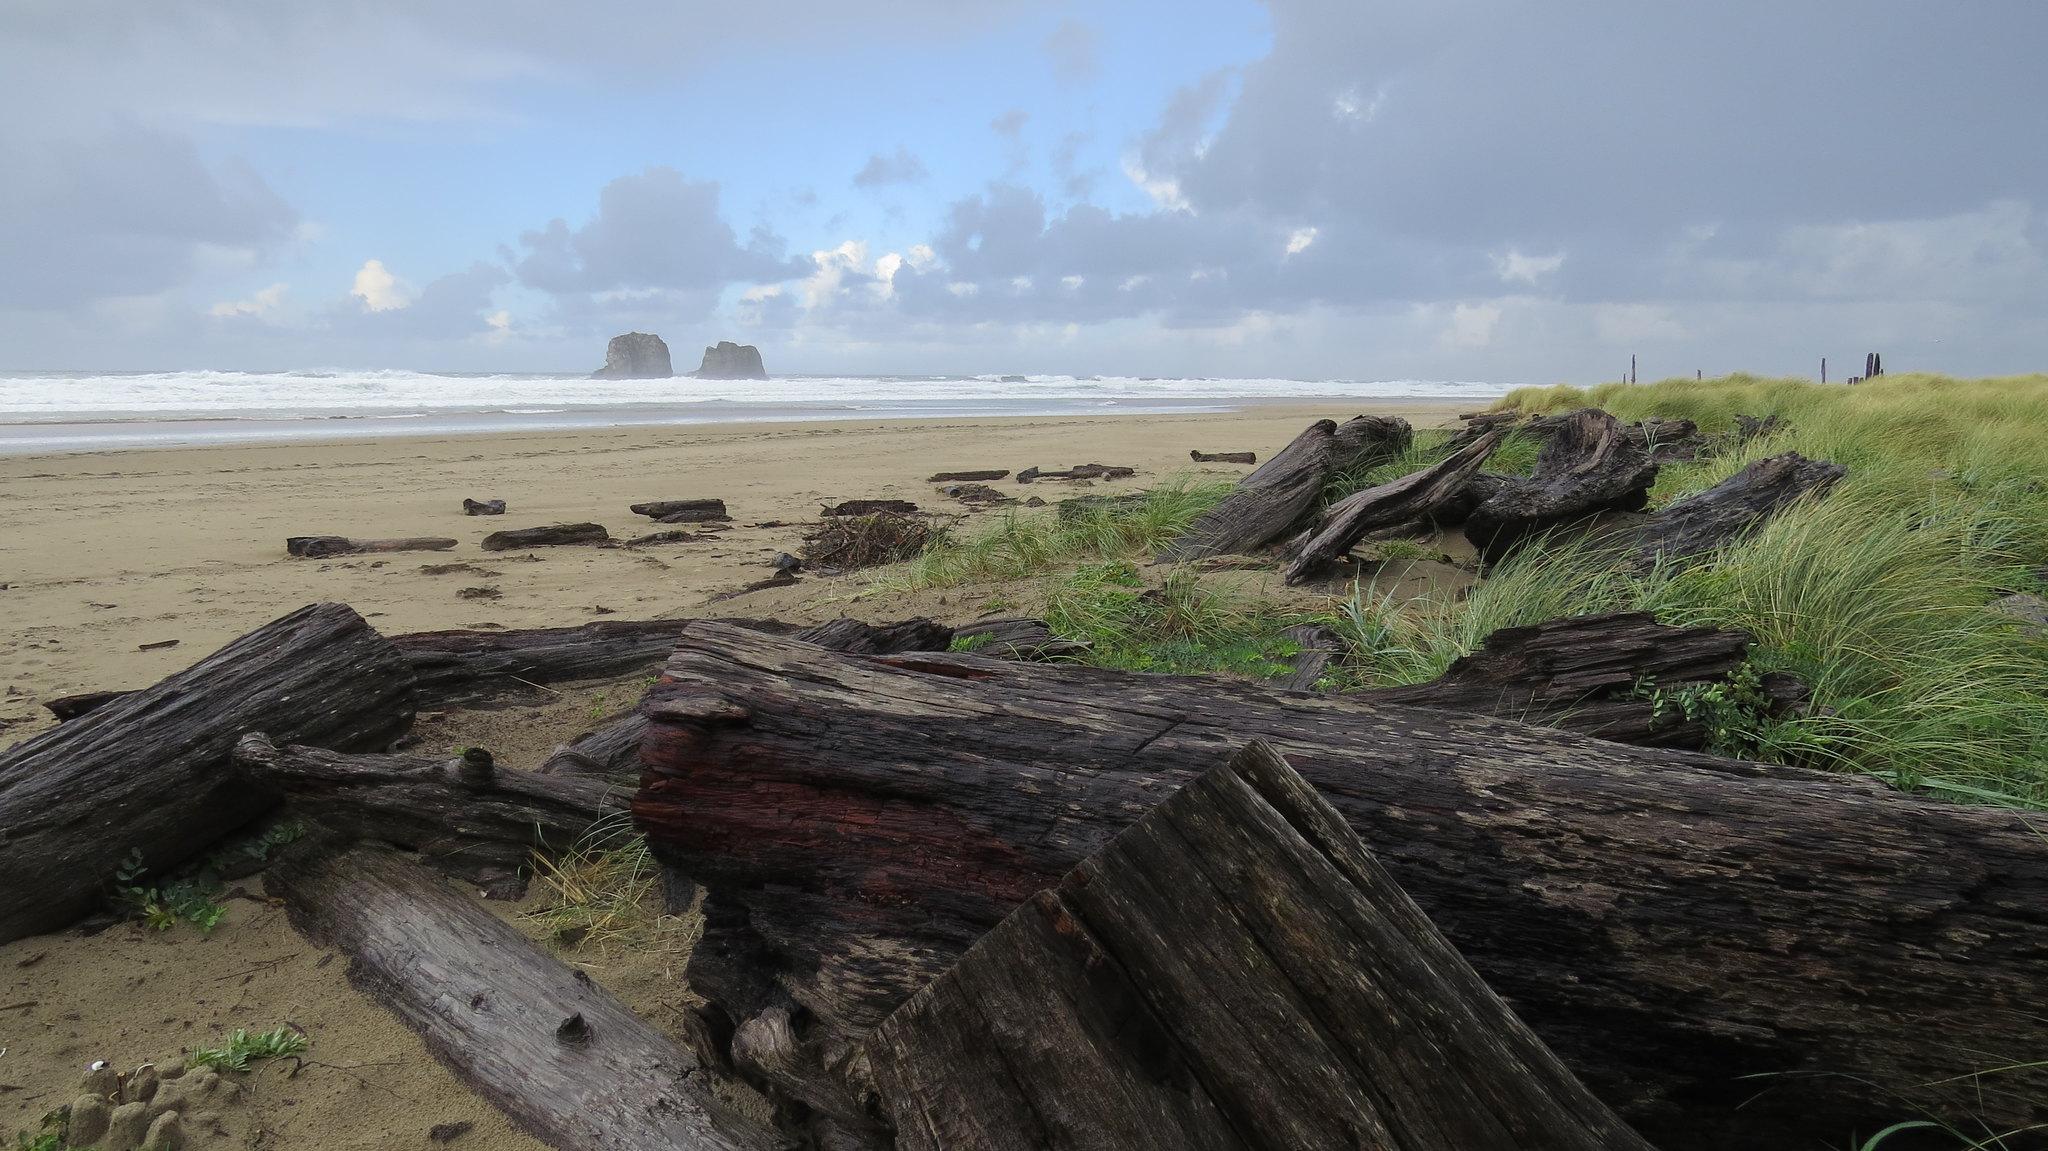 Driftwood on Rockaway Beach with a cloudy sky.